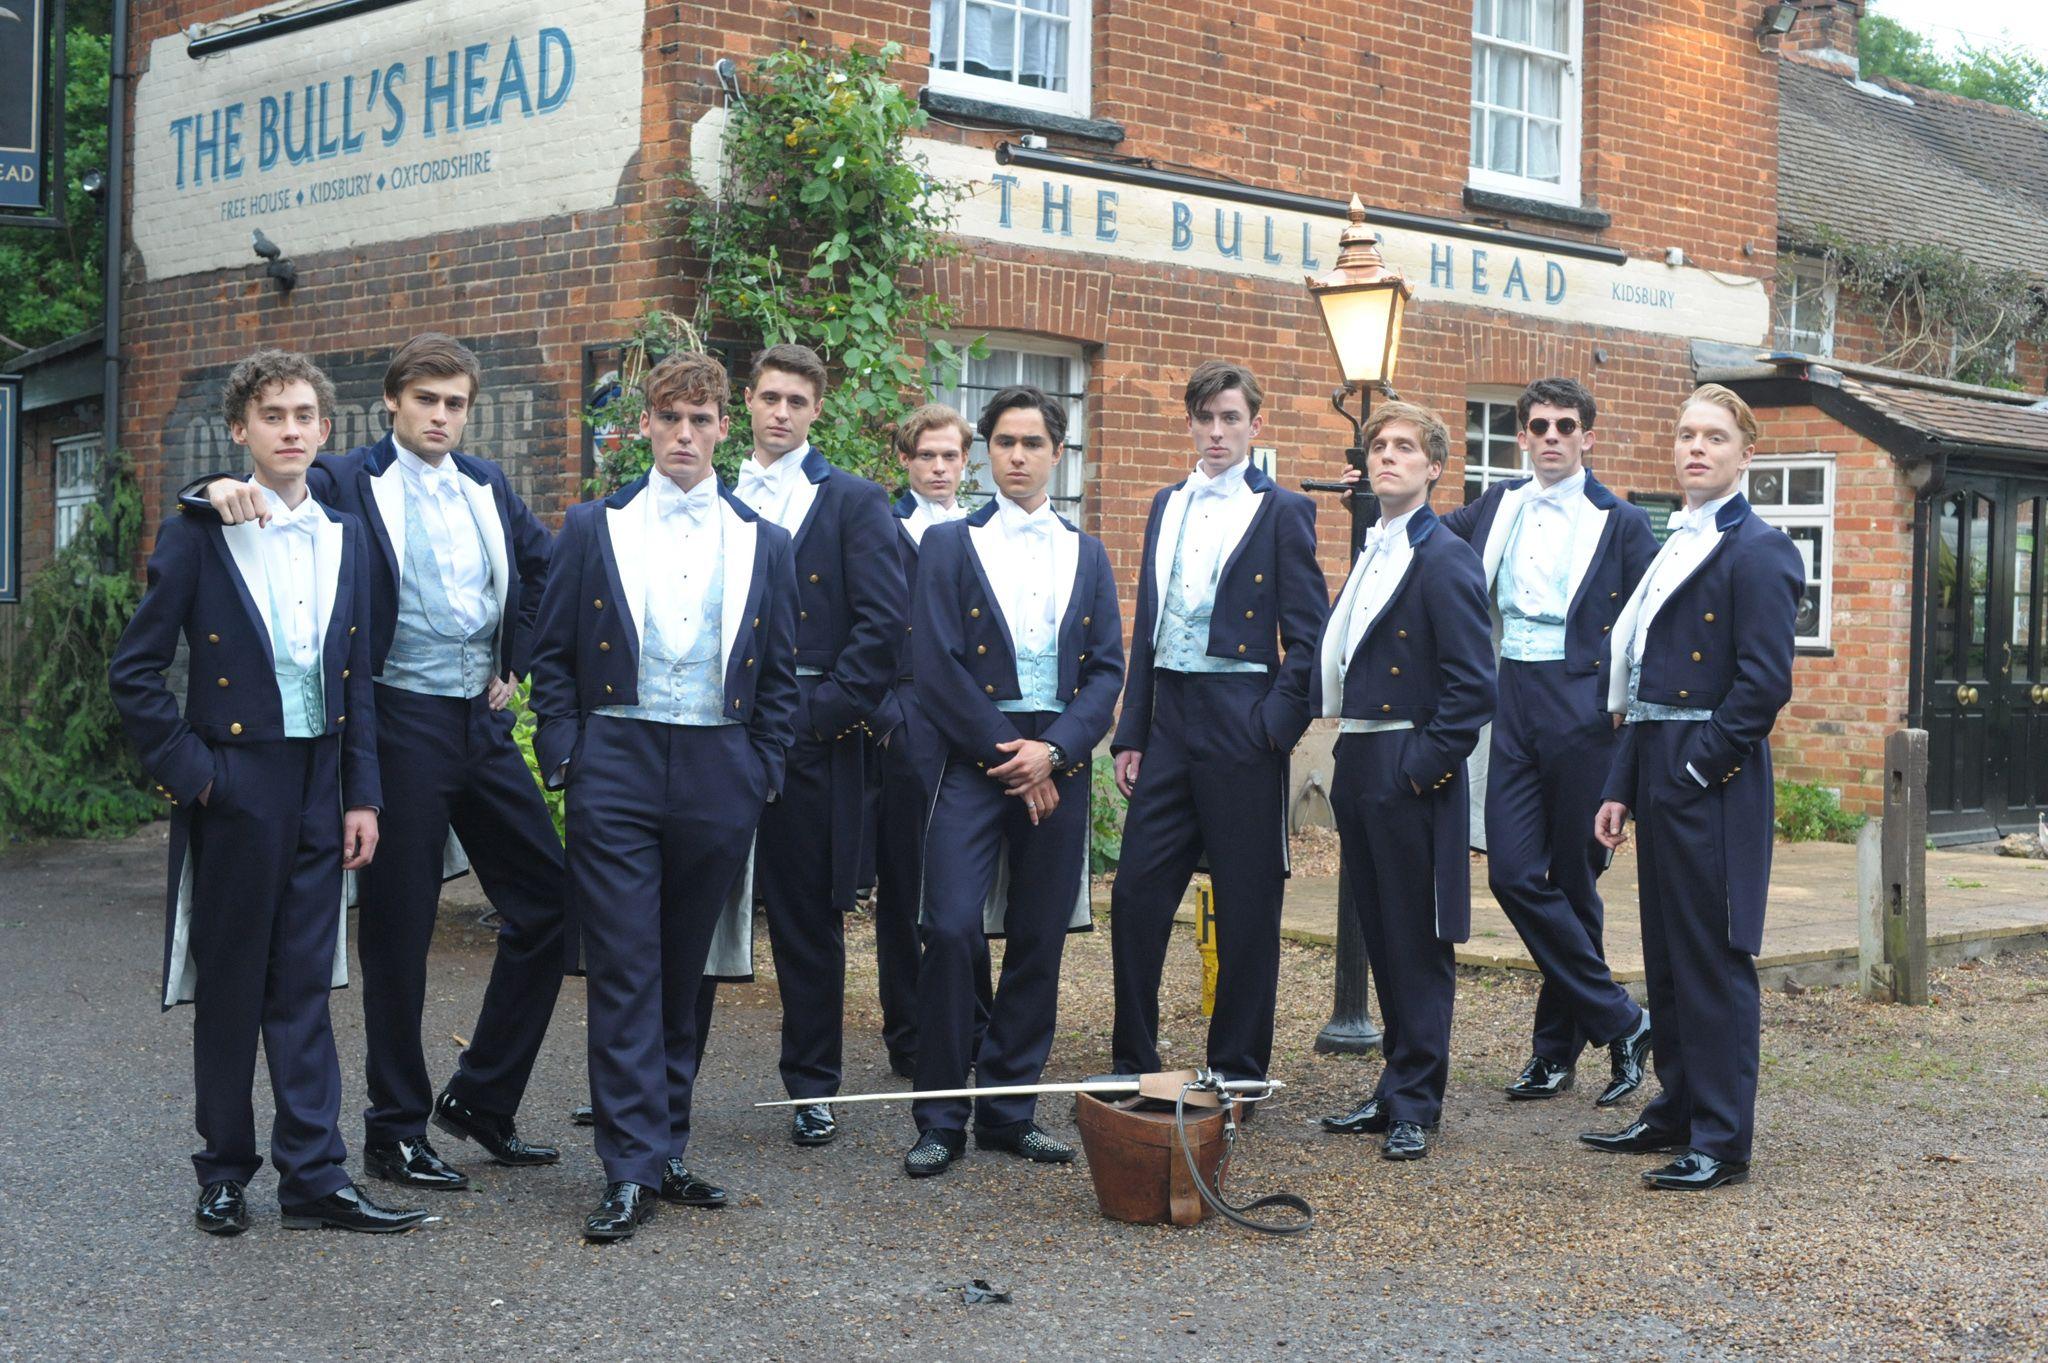 Https Uk Entertainment News A30773 Robbie Andrew Smith Grey Formal Trousers Abu 34 Nrm 1415027252 Riot Club